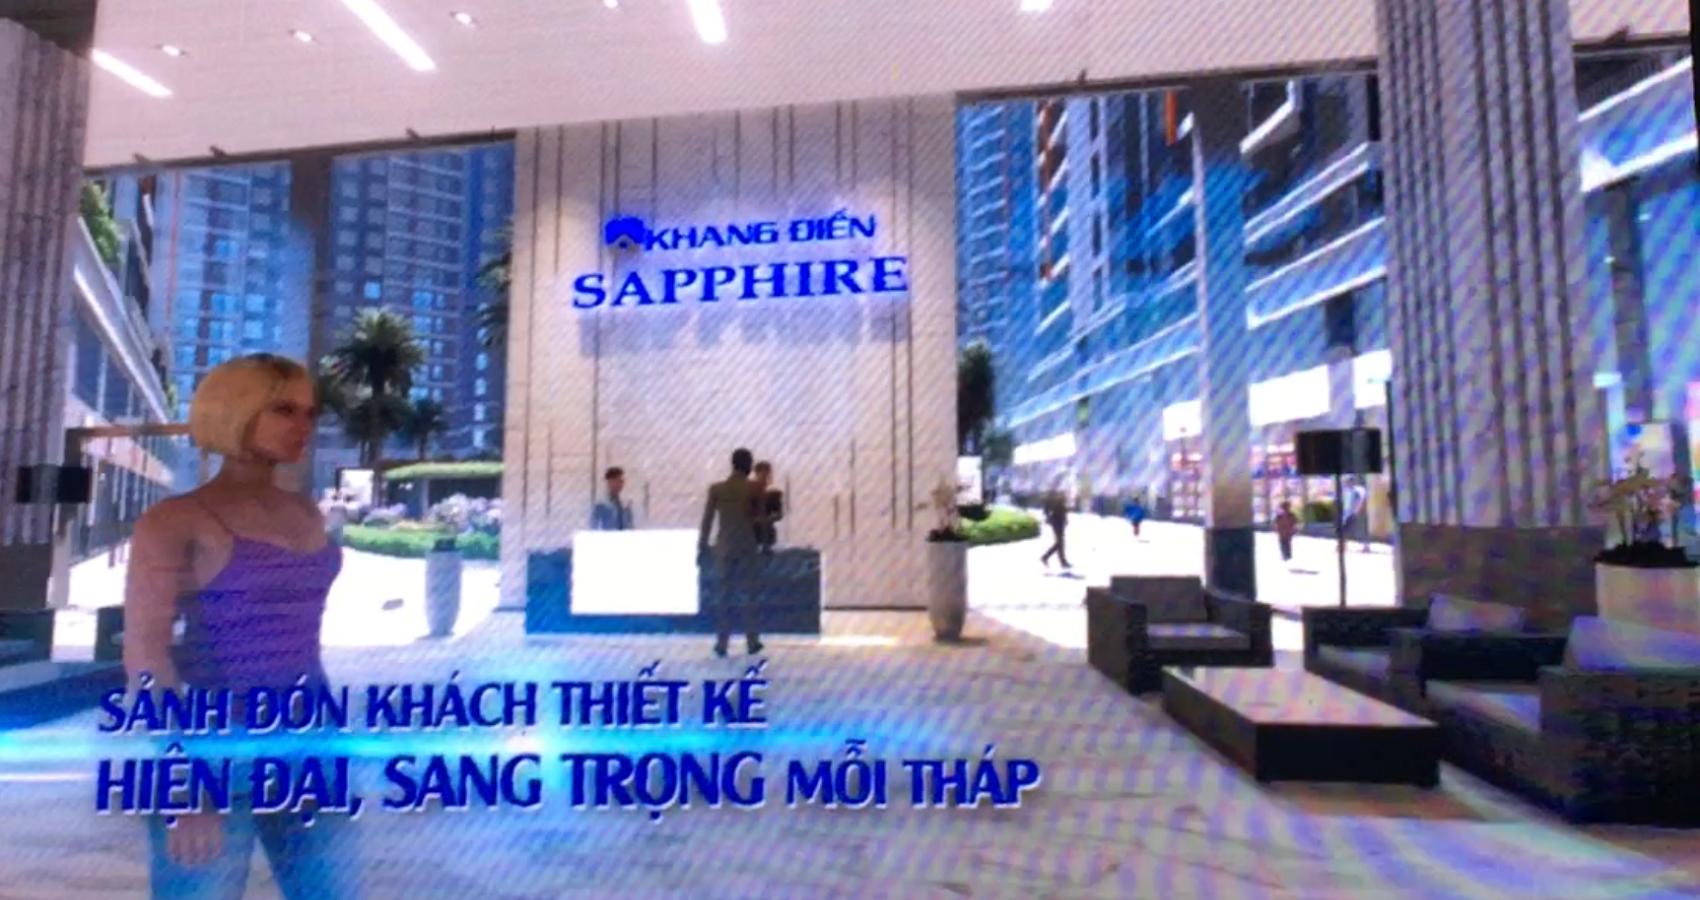 phoi canh du an saphire khang dien phu huu khang dien hcm 05 1